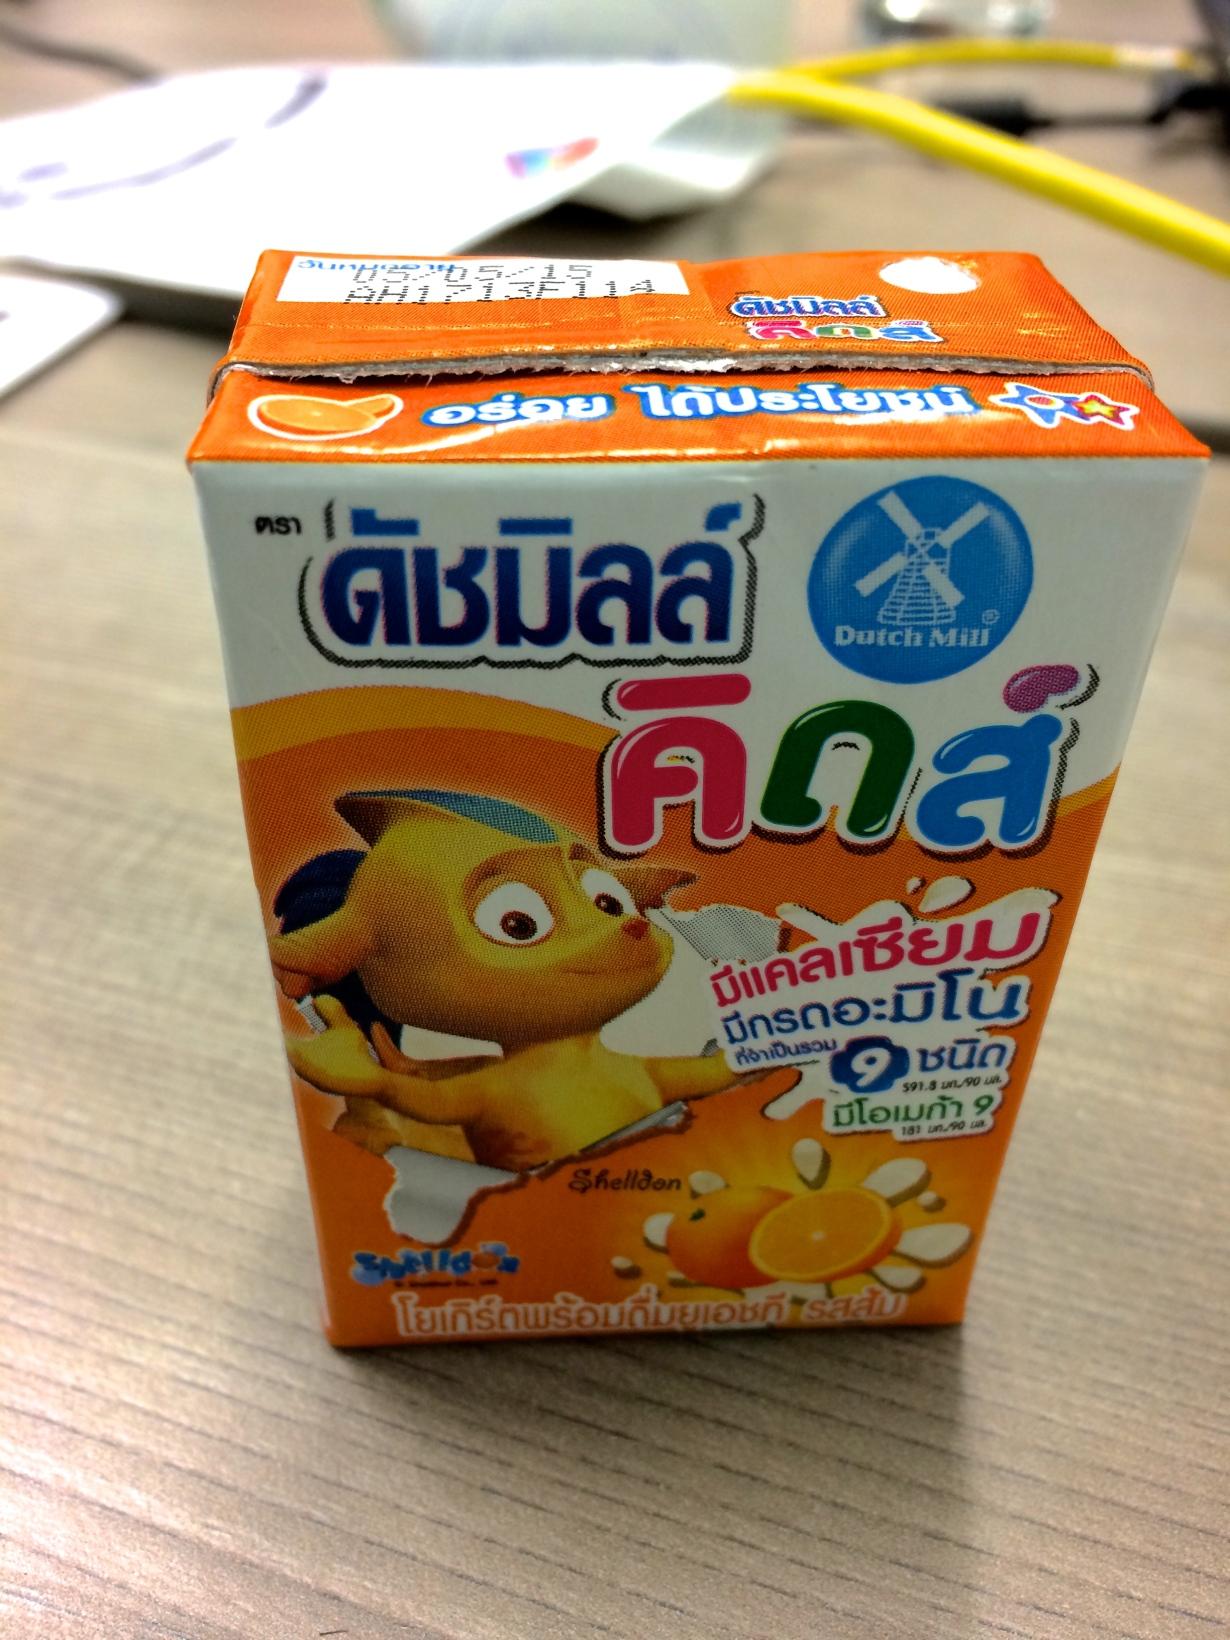 Orange milk anyone?